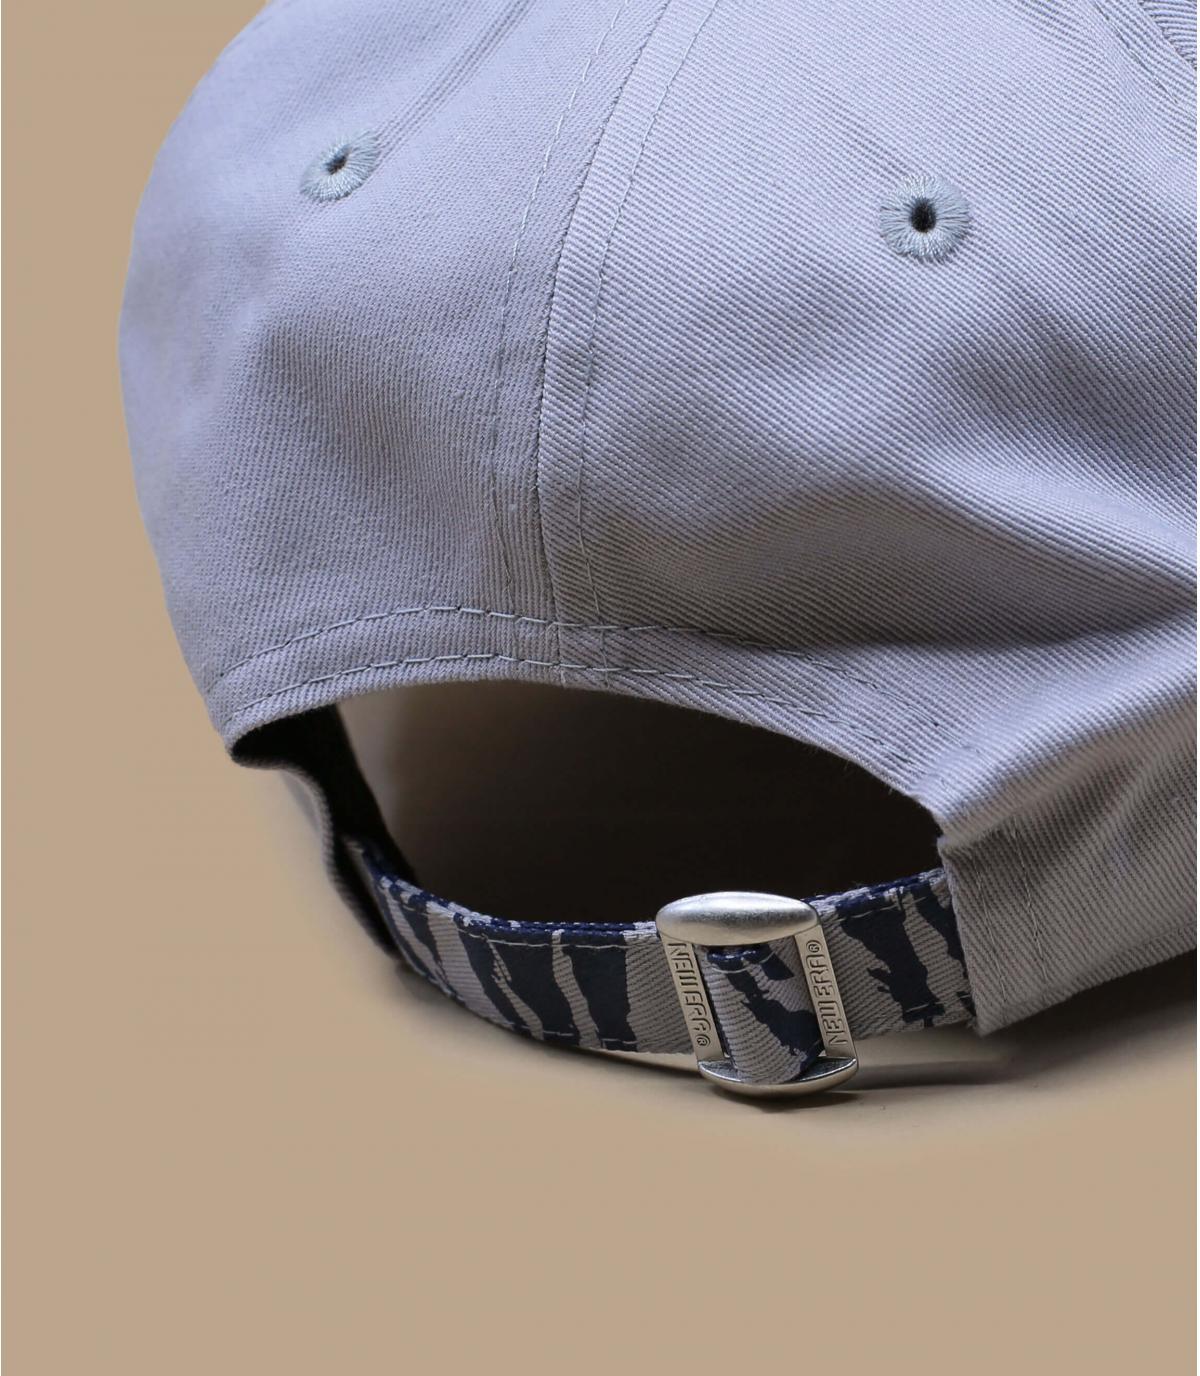 Details Infill 940 NY gray - afbeeling 4